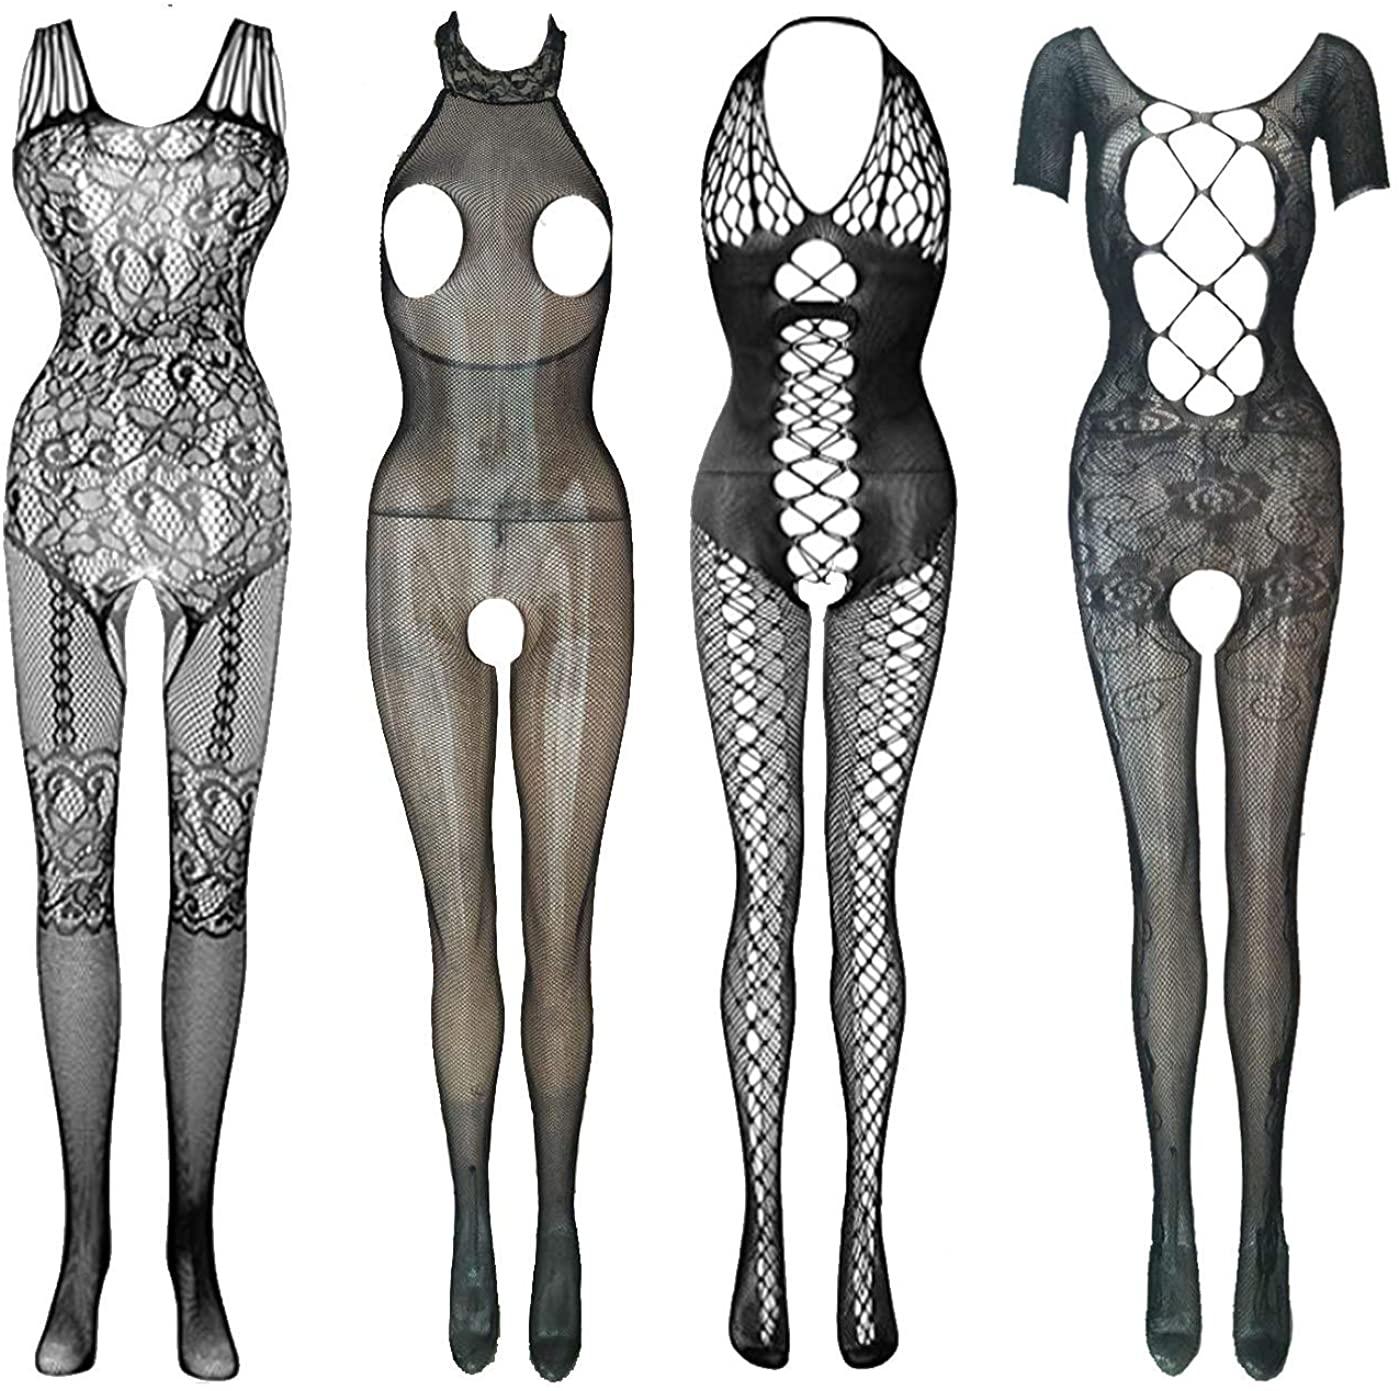 4 pcs Fishnet Bodysuit Women's Lace Stockings Lingerie Floral Fishnet Bodysuits Lingerie Nightwear for Romantic Date Wearing